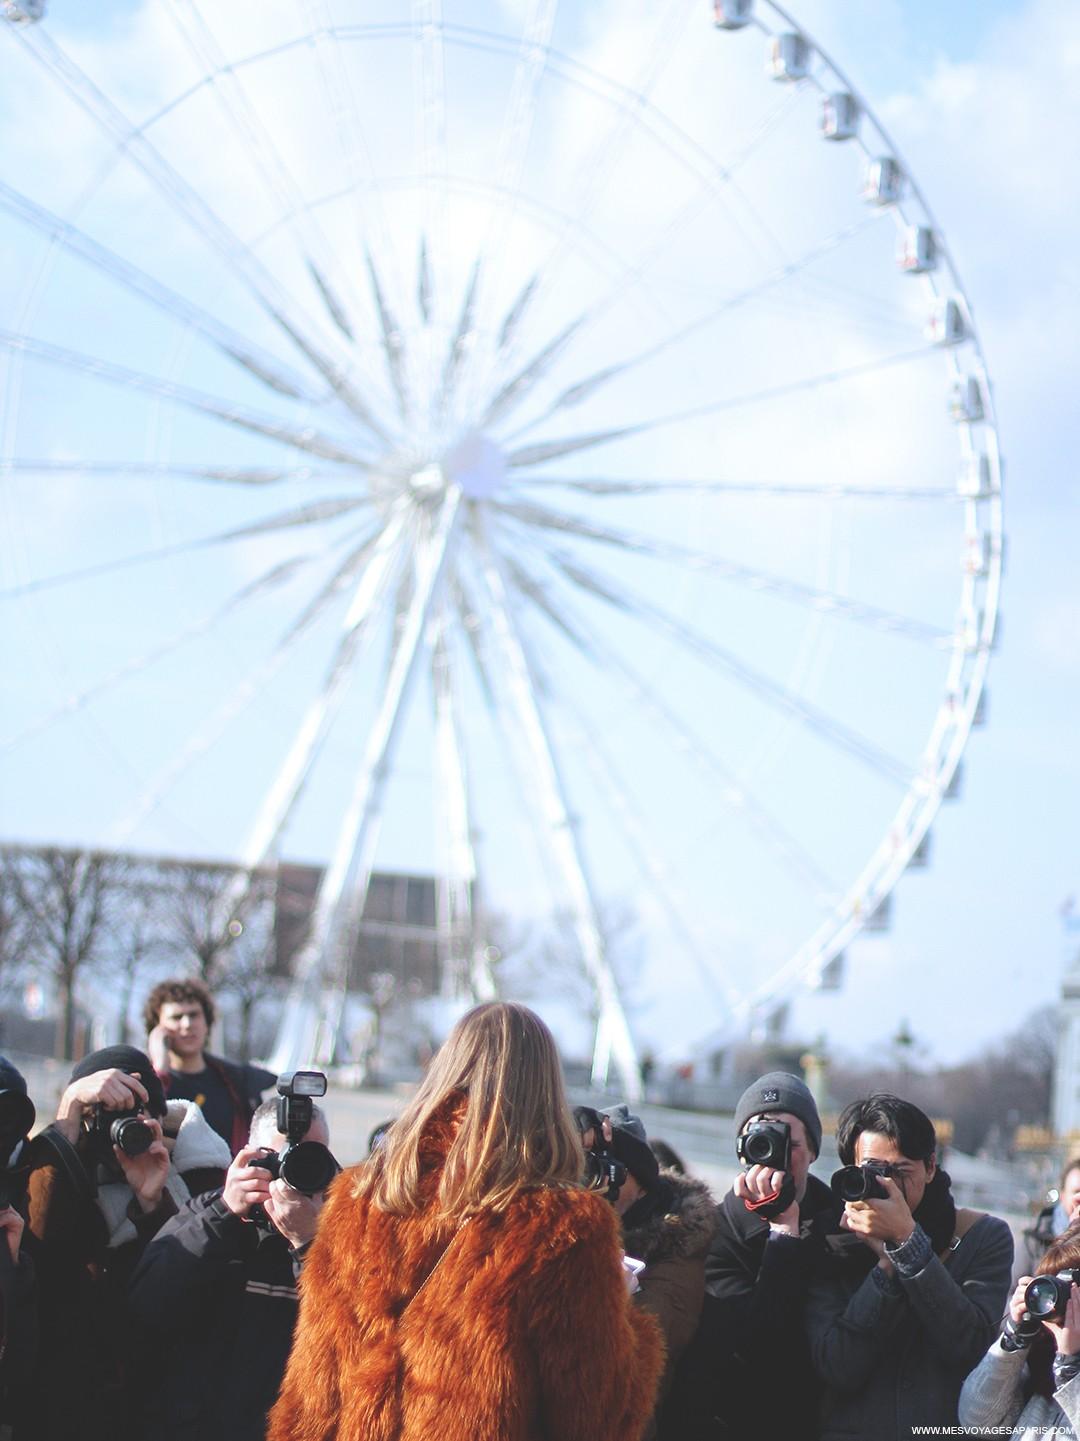 Paris-fashion-week-street-style-fashion-blog-mes-voyages-a-paris-2016-tuileries